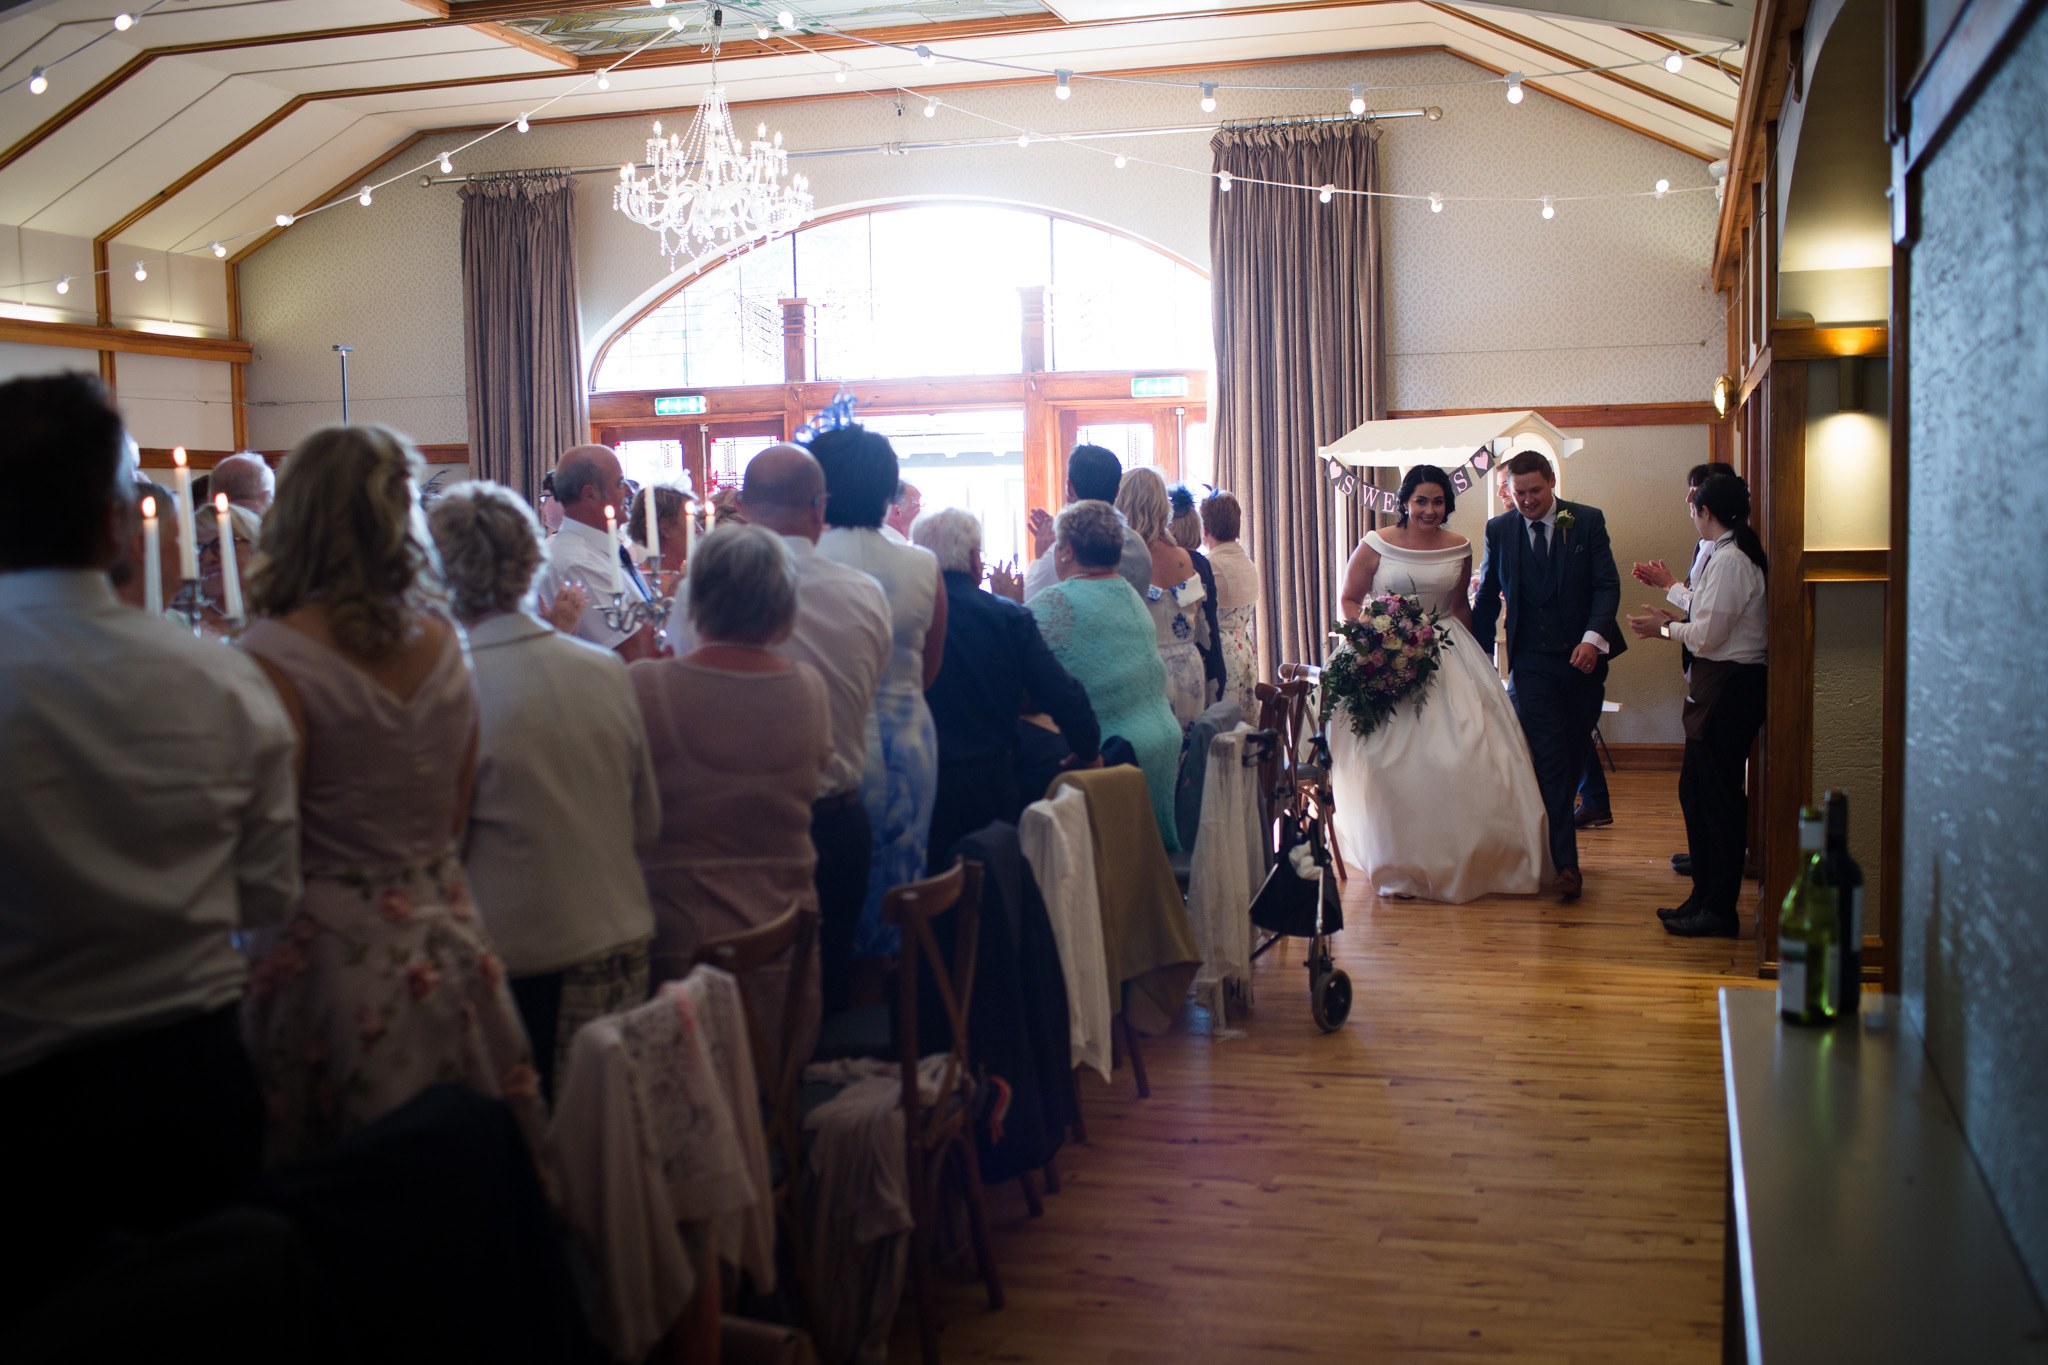 Mark_Barnes_Northern_Ireland_Wedding_Photography_Lusty_Beg_Wedding_Photography_Hayley&Brian-33.jpg